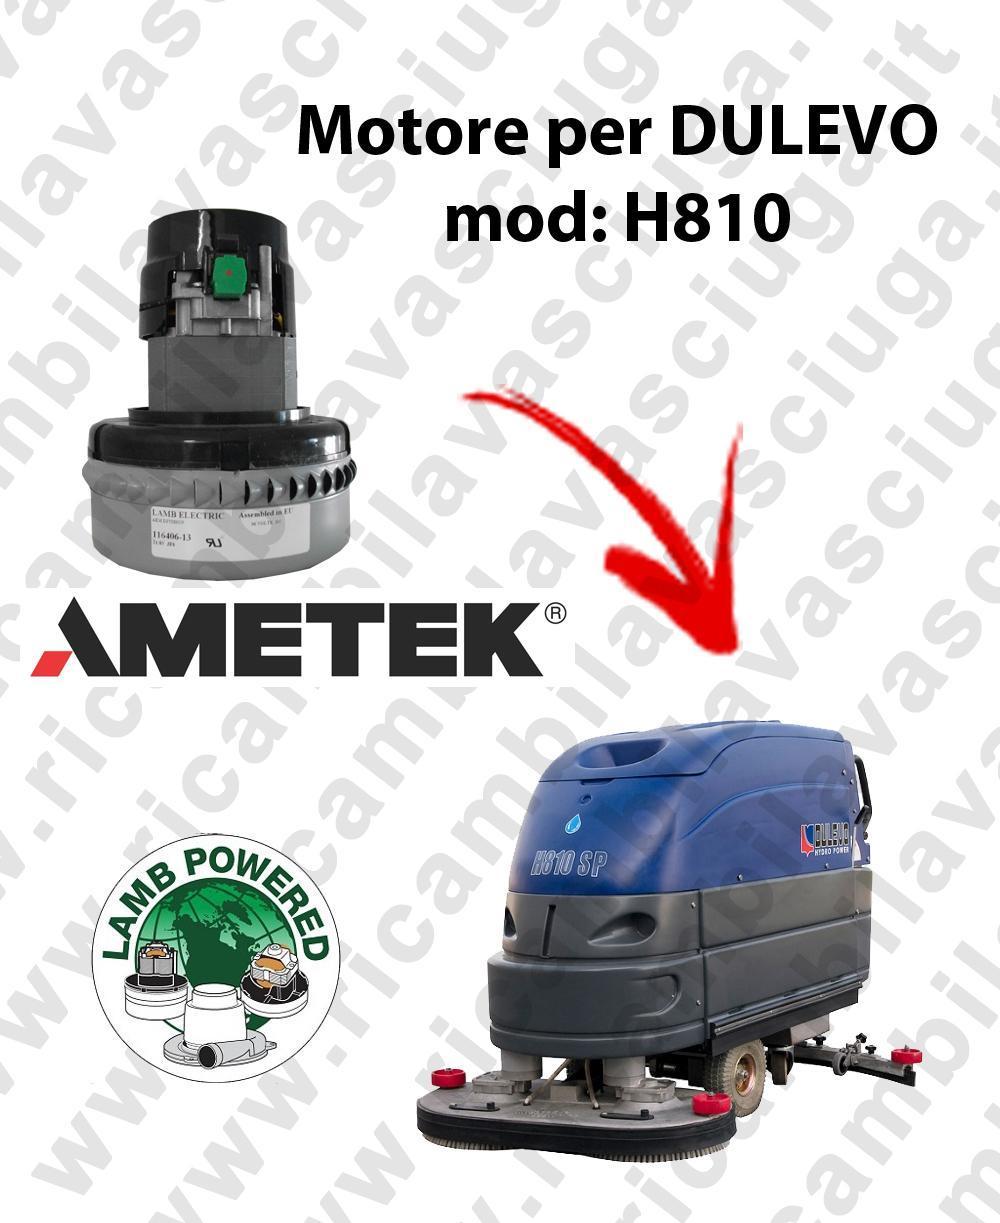 H810 Saugmotor LAMB AMETEK für scheuersaugmaschinen DULEVO